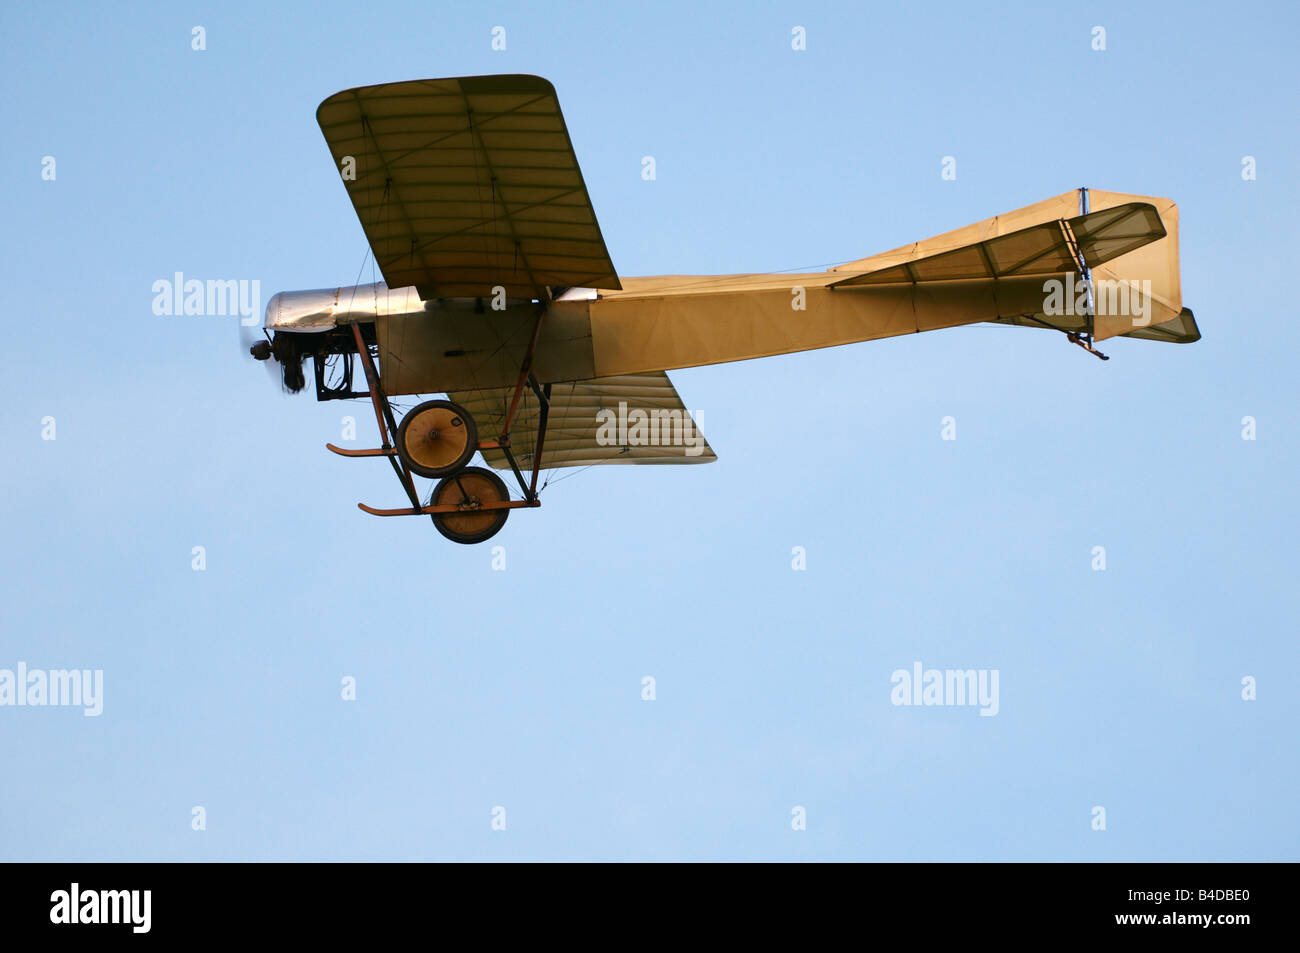 Shuttleworth (Collection) Air Show 2008 Blackburn Monoplane Stock Photo